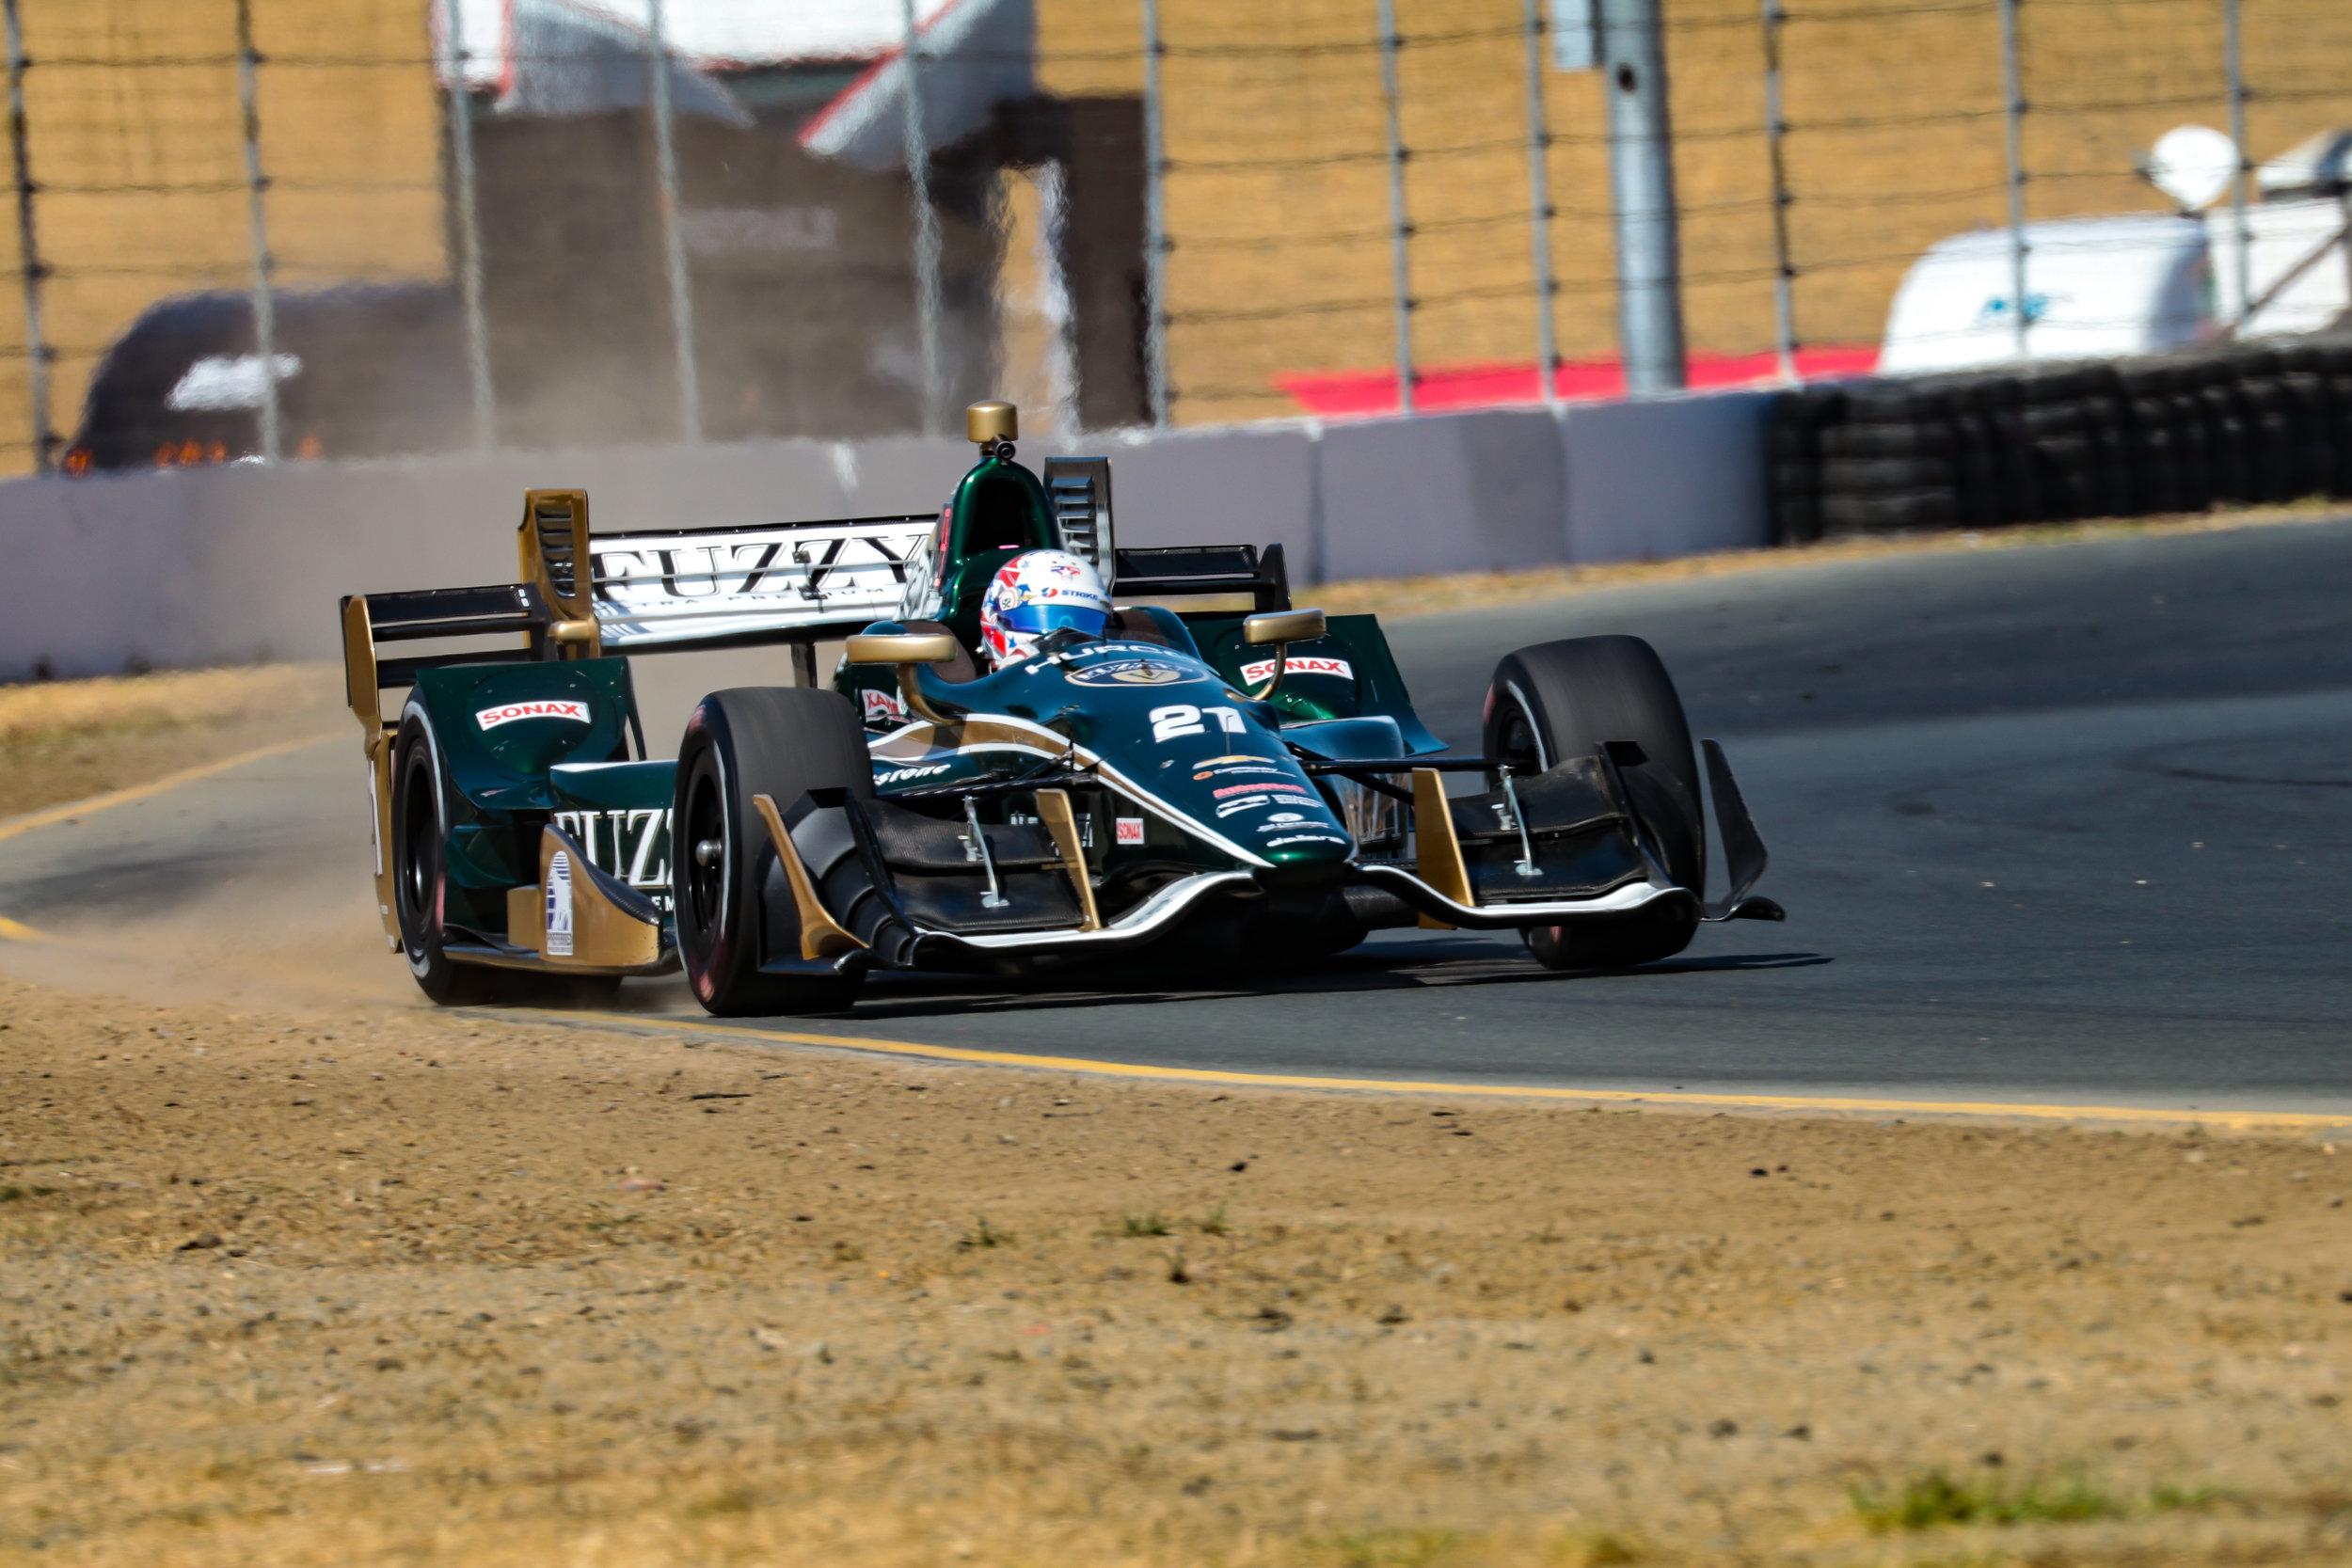 Indy16-2410.jpg